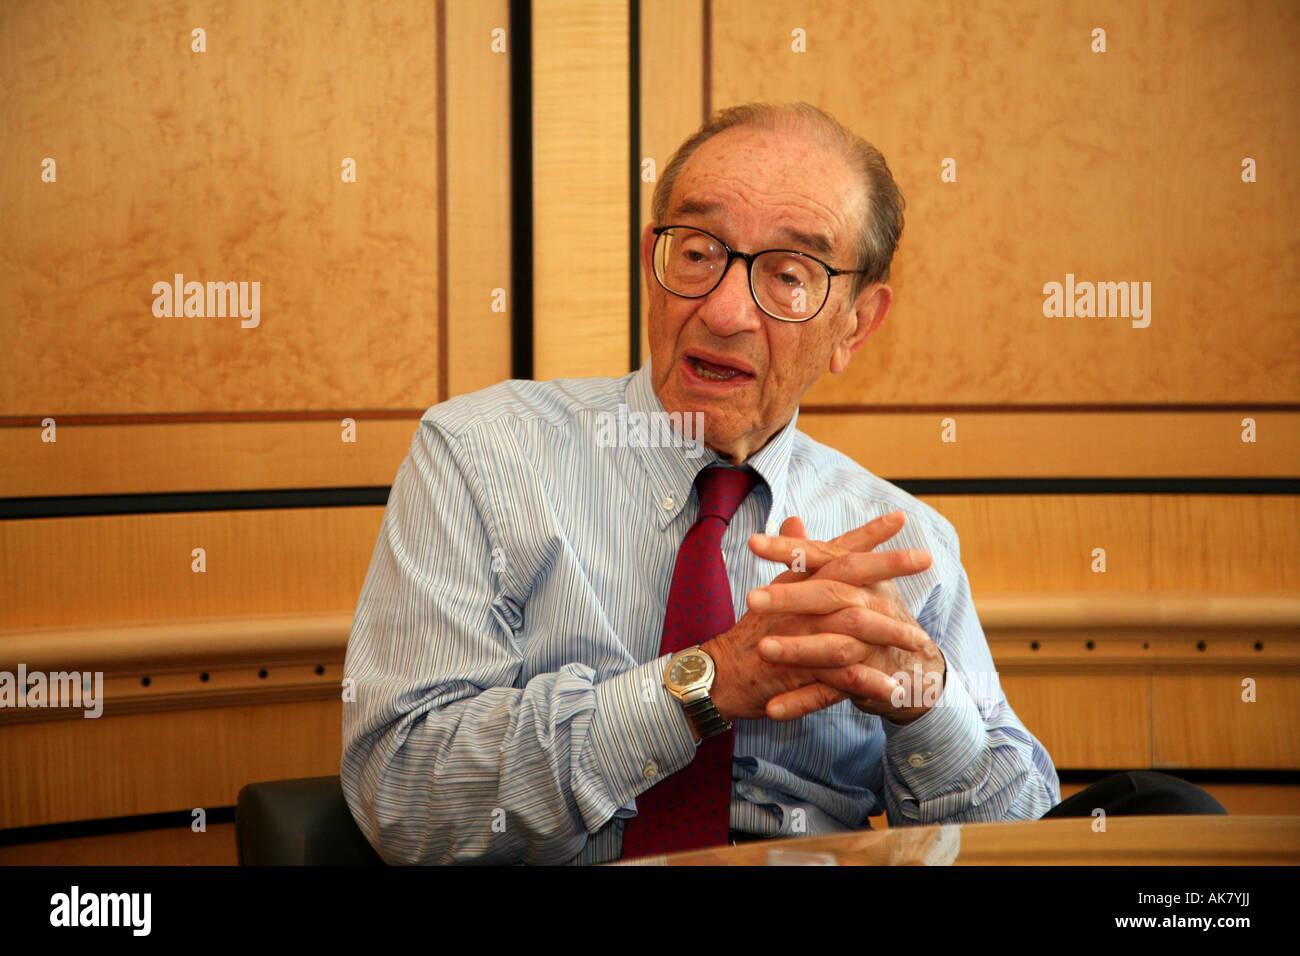 Alan Greenspan in seinem Büro in Washington, D.C. Stockbild